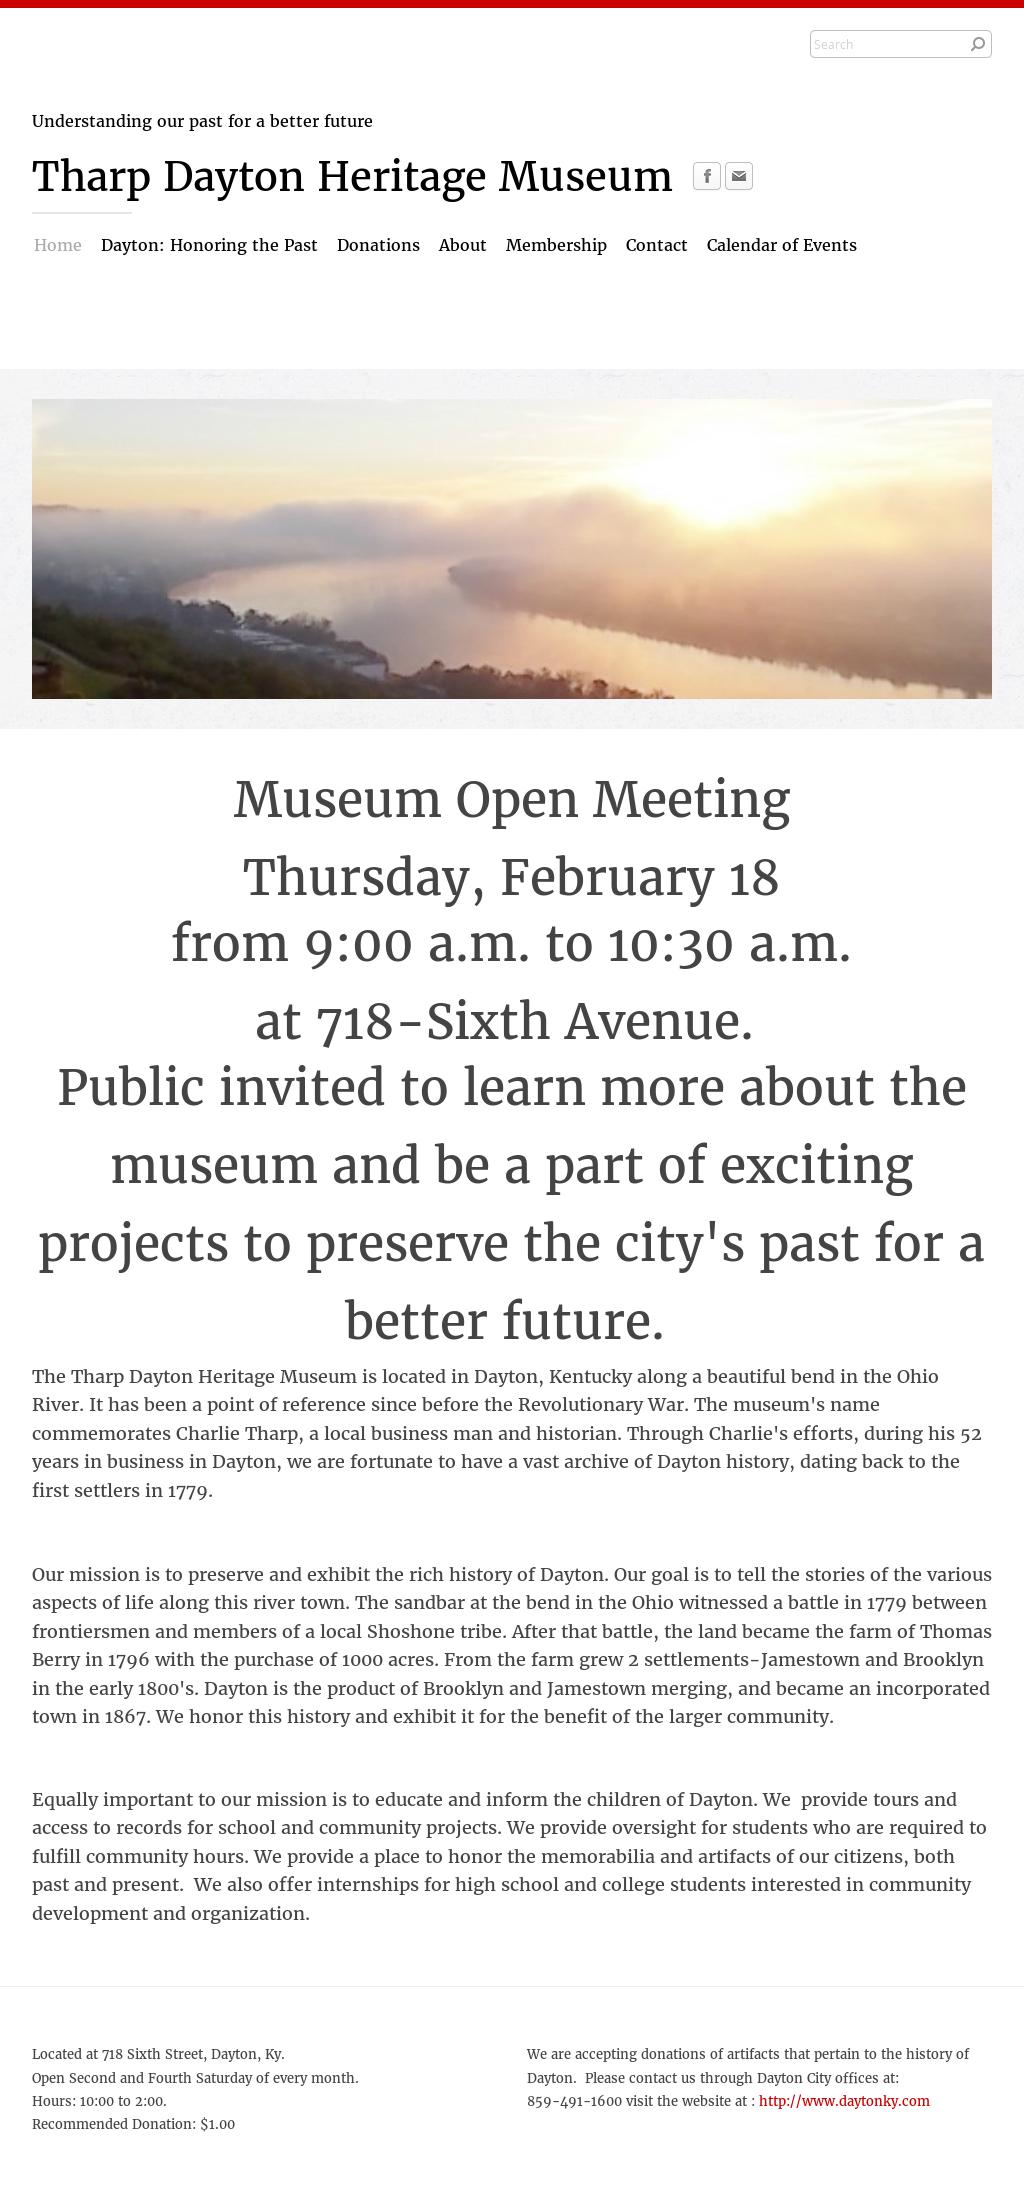 Tharp Dayton Heritage Museum Competitors, Revenue and